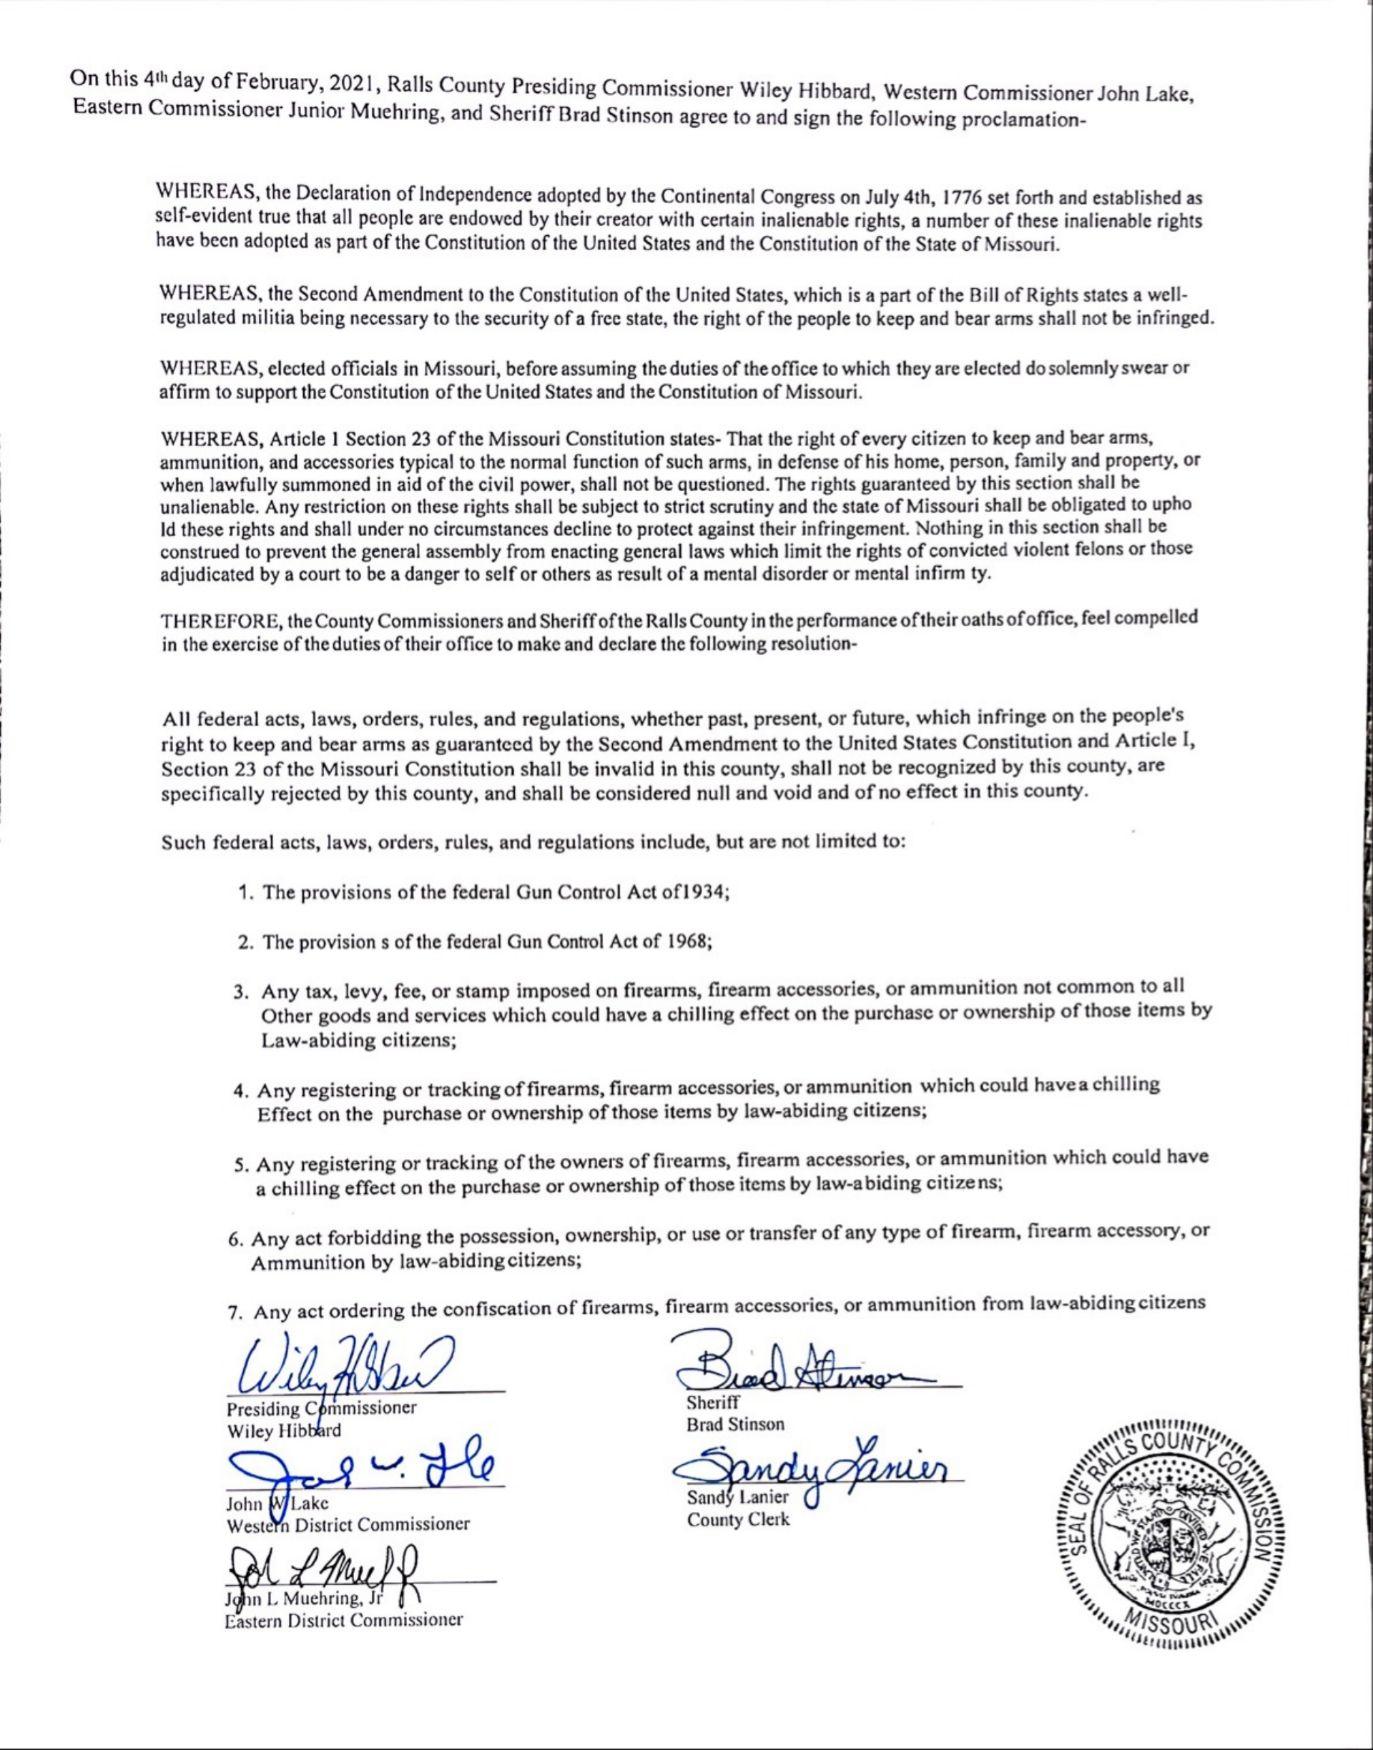 Ralls County, Missouri Pro-Second Amendment Proclamation